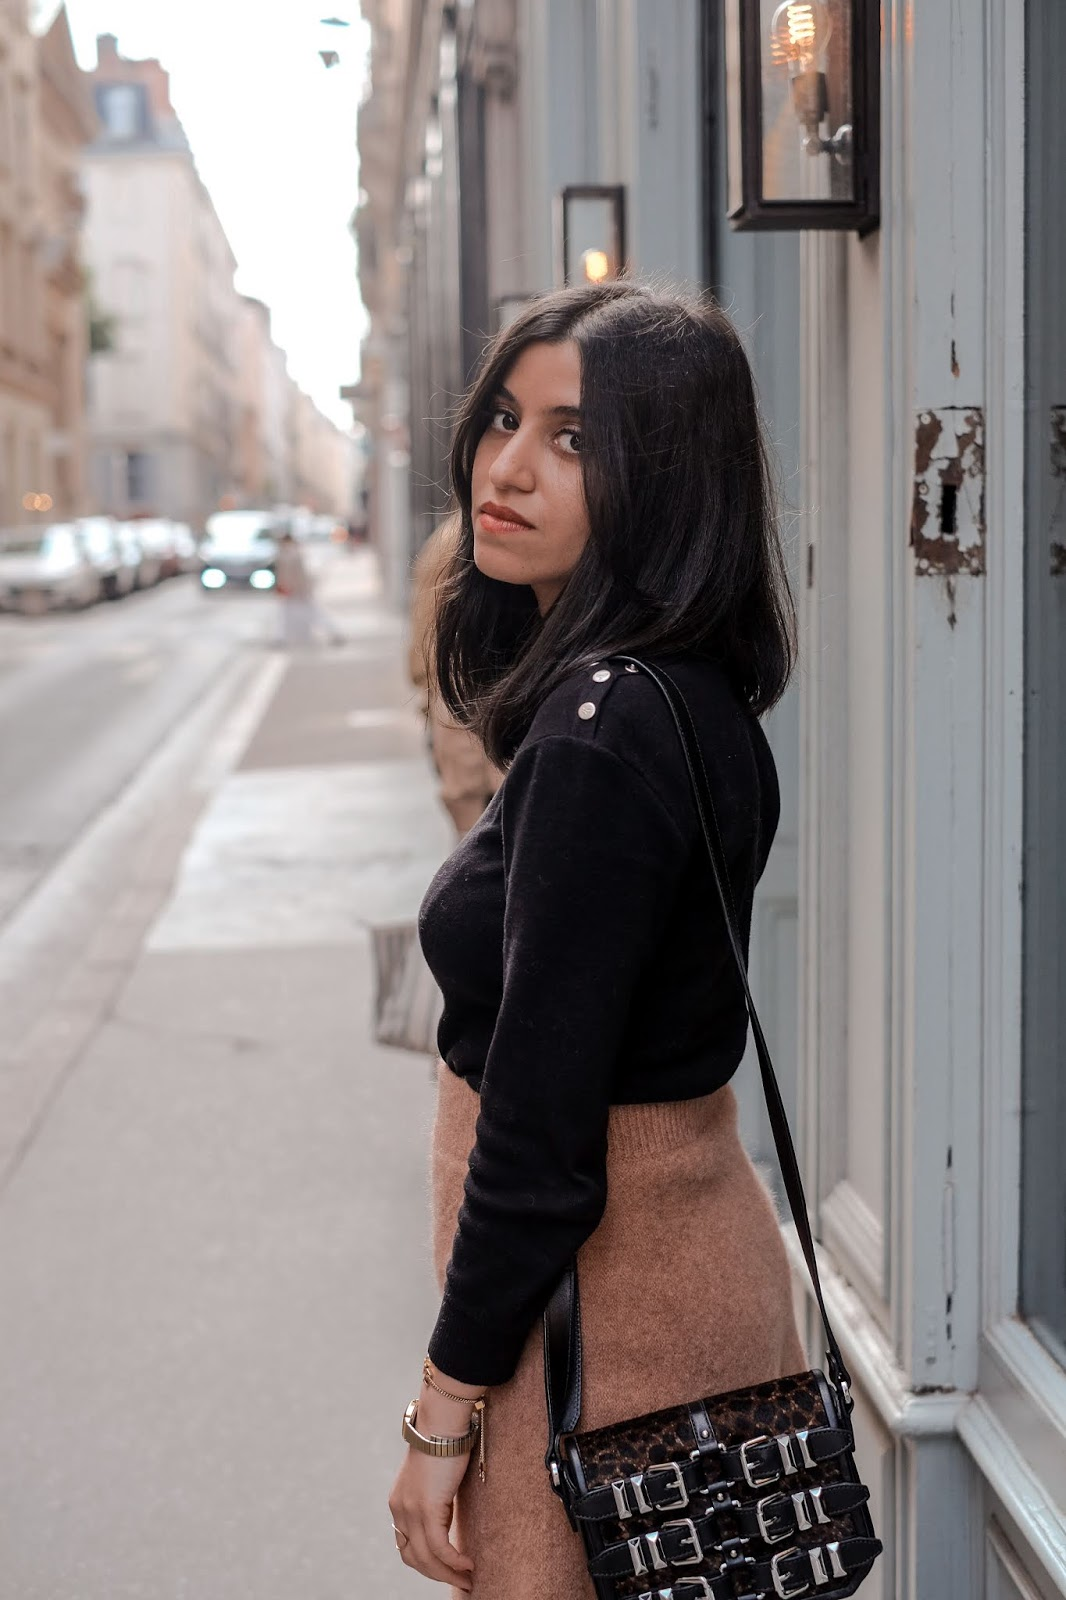 blog mode lyon, blogueuse lyonnaise, blogueuse à lyon, blogueuse mode, ameni daily, amenidaily, cos store